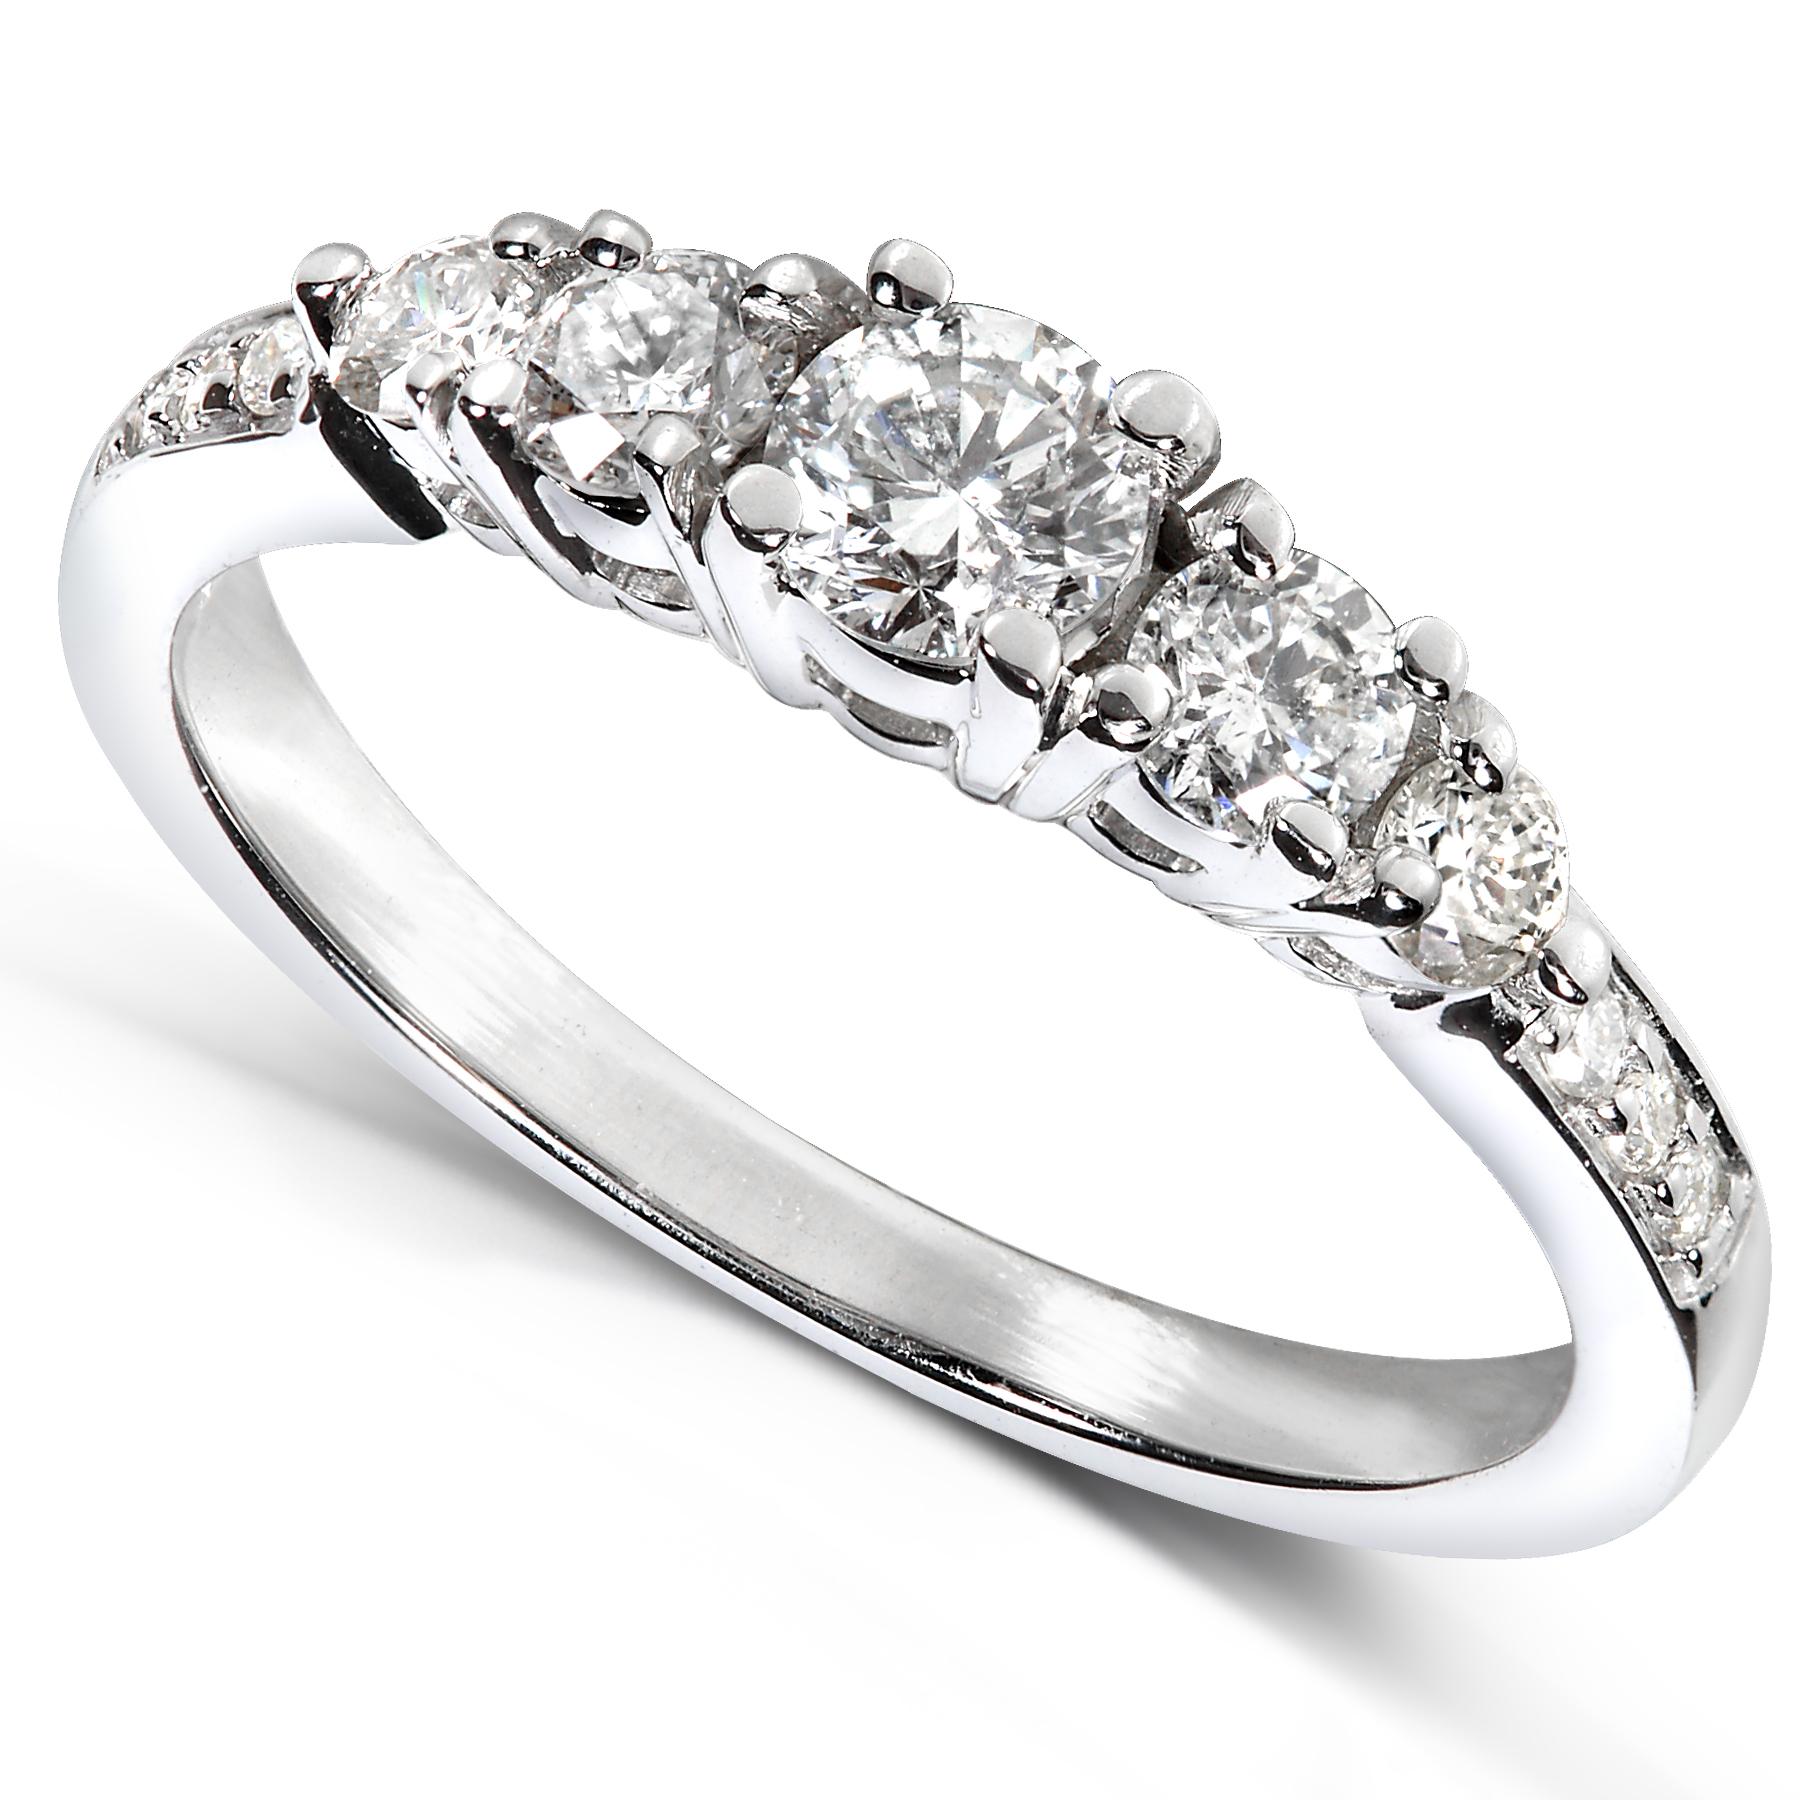 Diamond-Me Diamond Engagement Ring 5/8 carat (ct.tw) in 14k White Gold